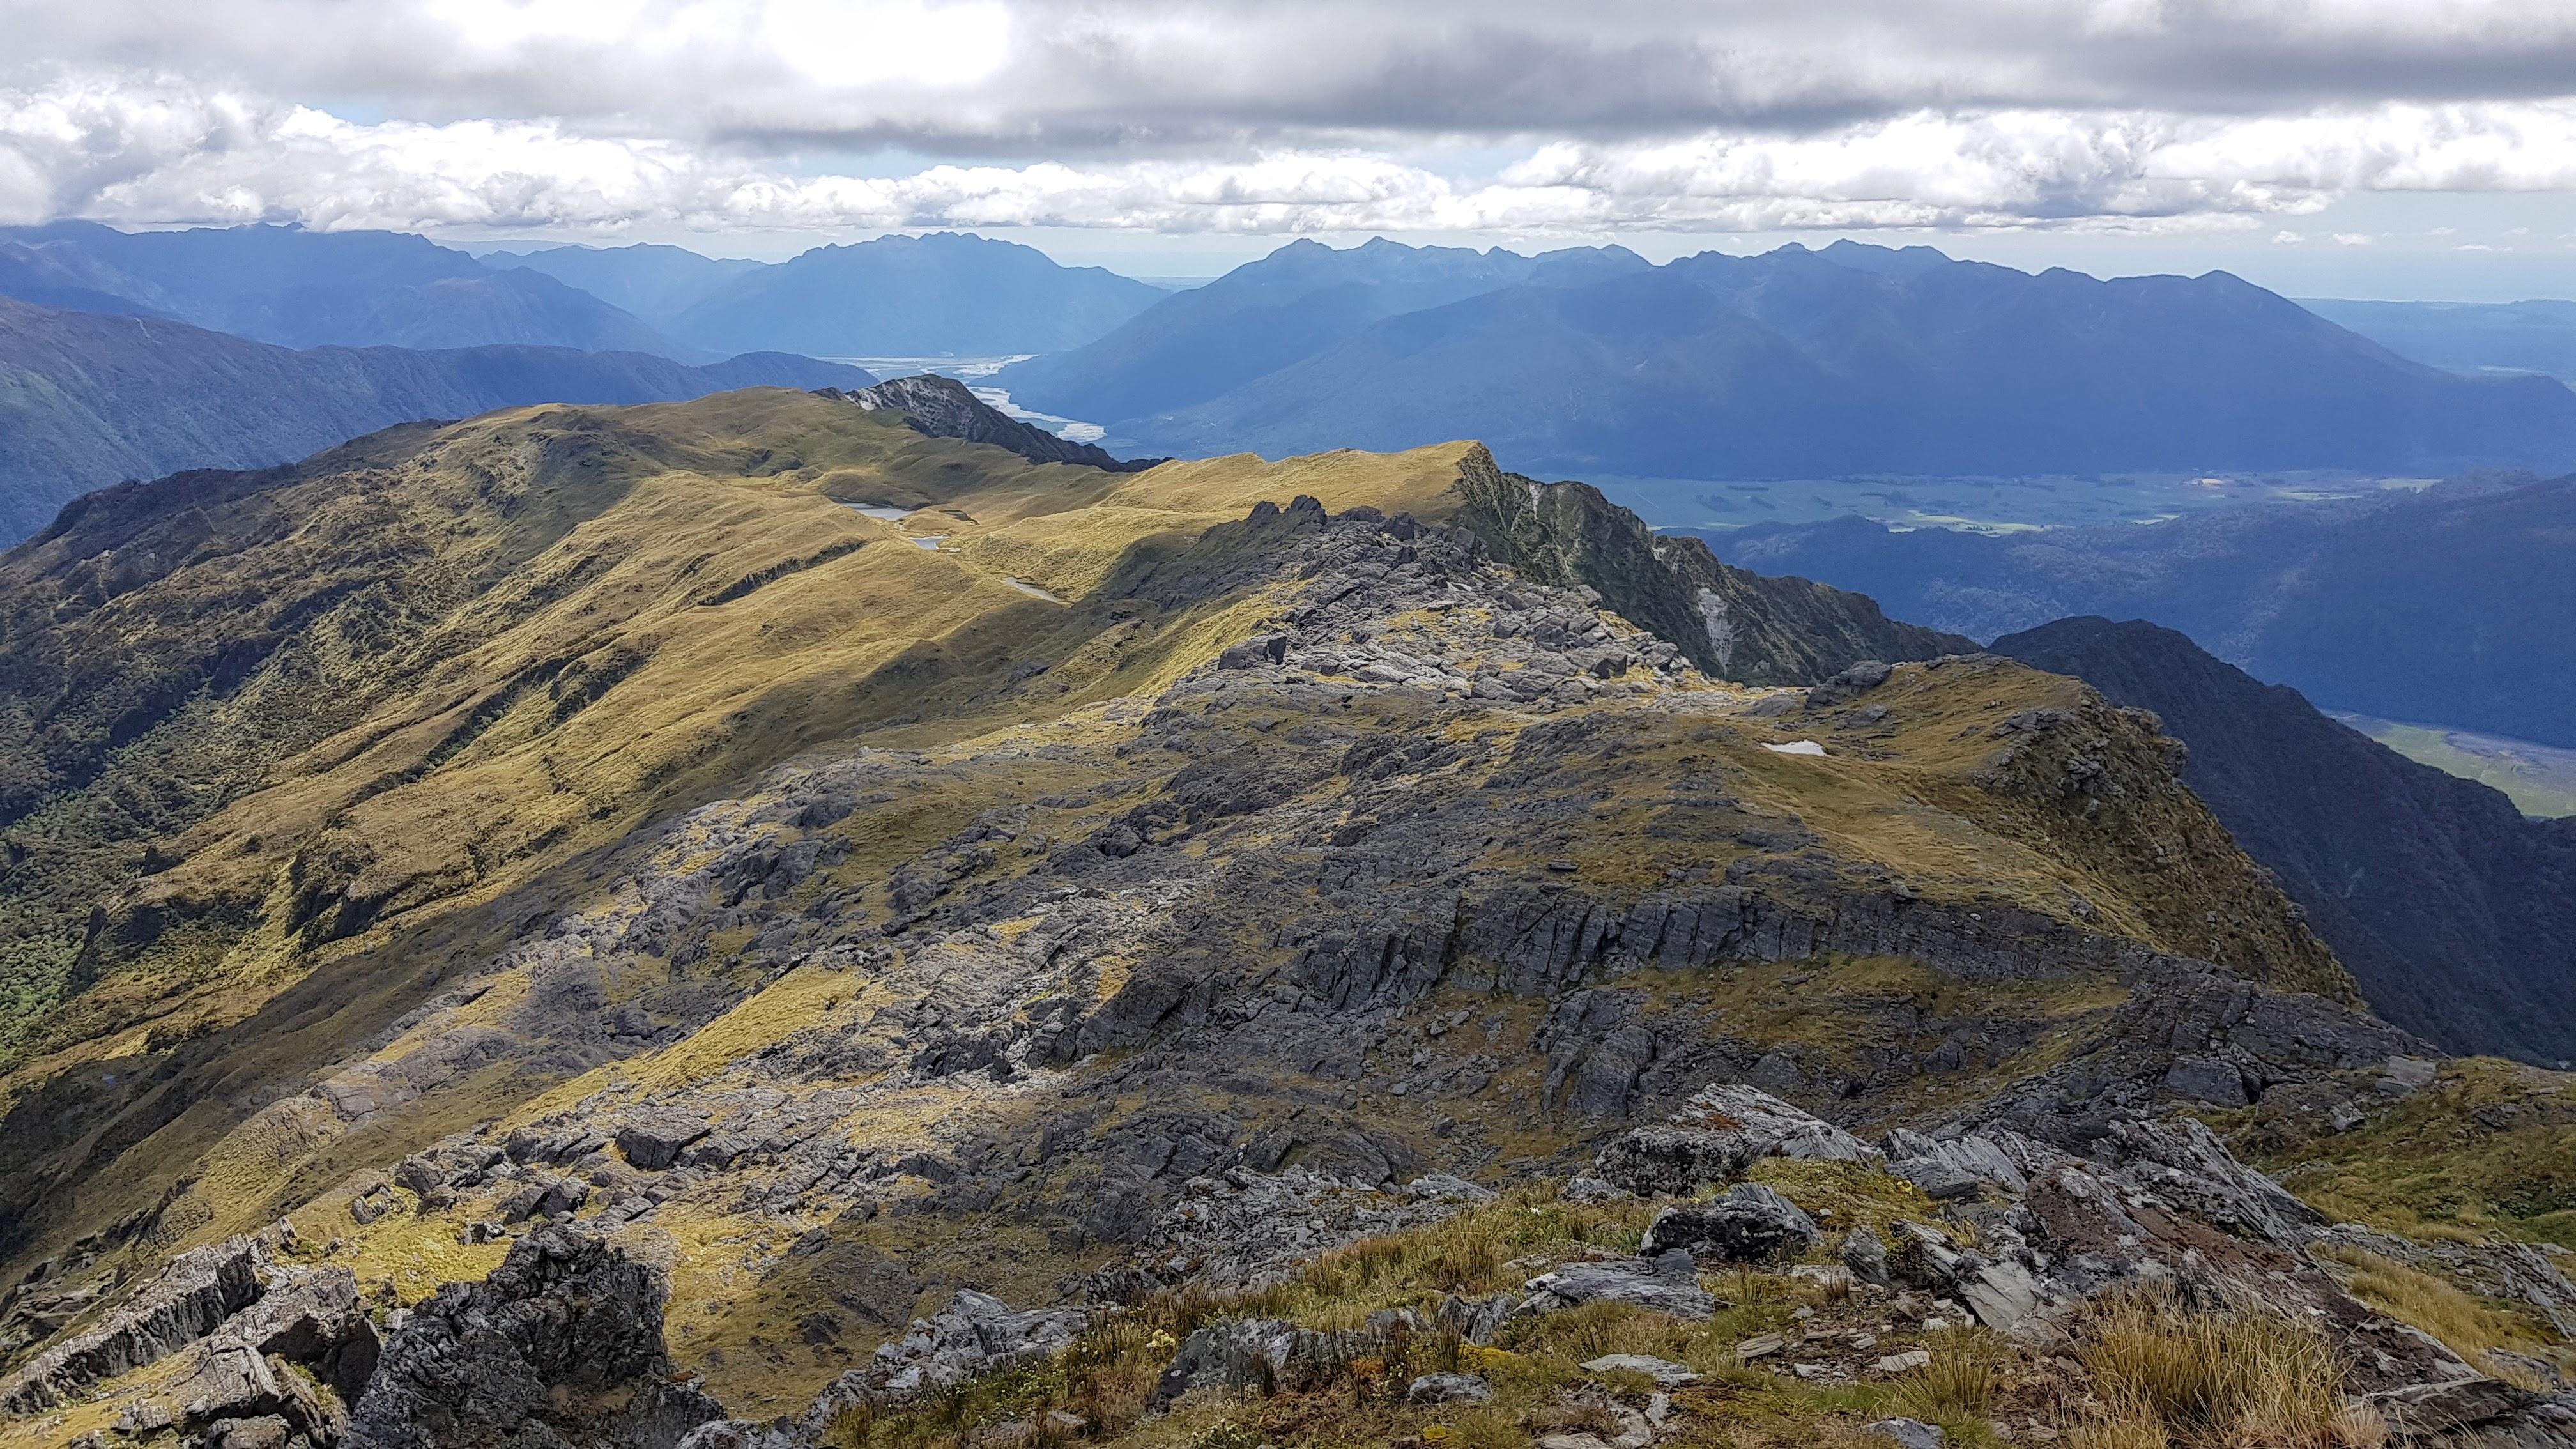 Views down the mountain